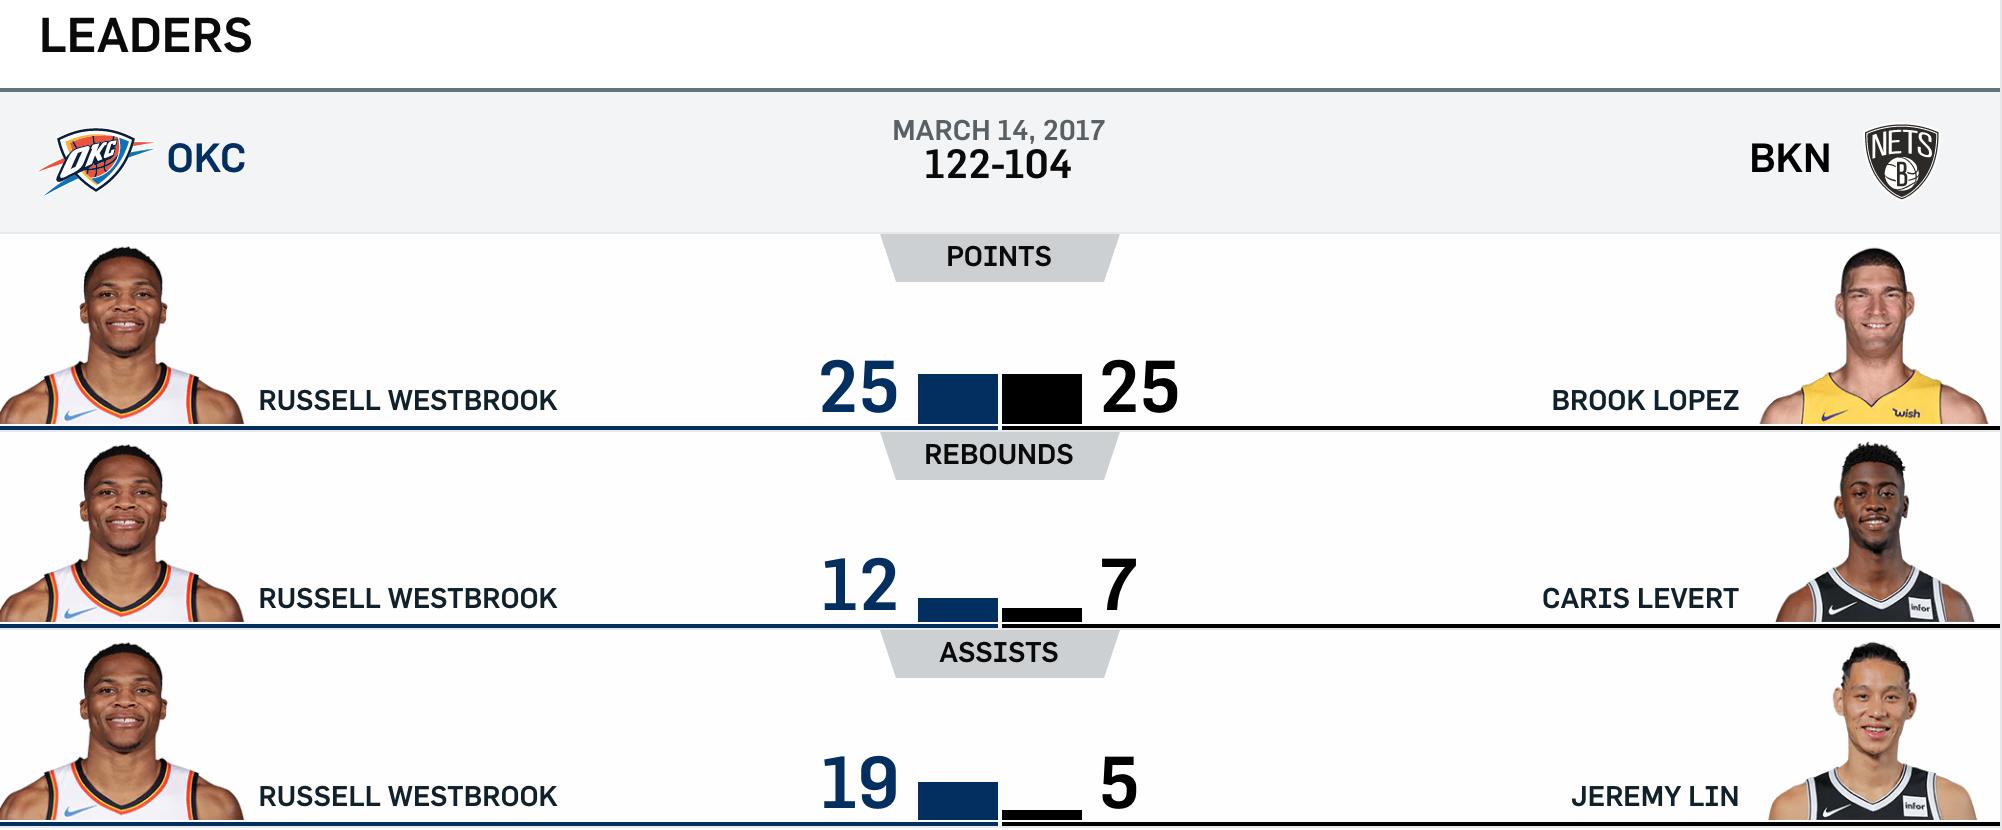 Nets vs Thunders 3-14-17 Leaders